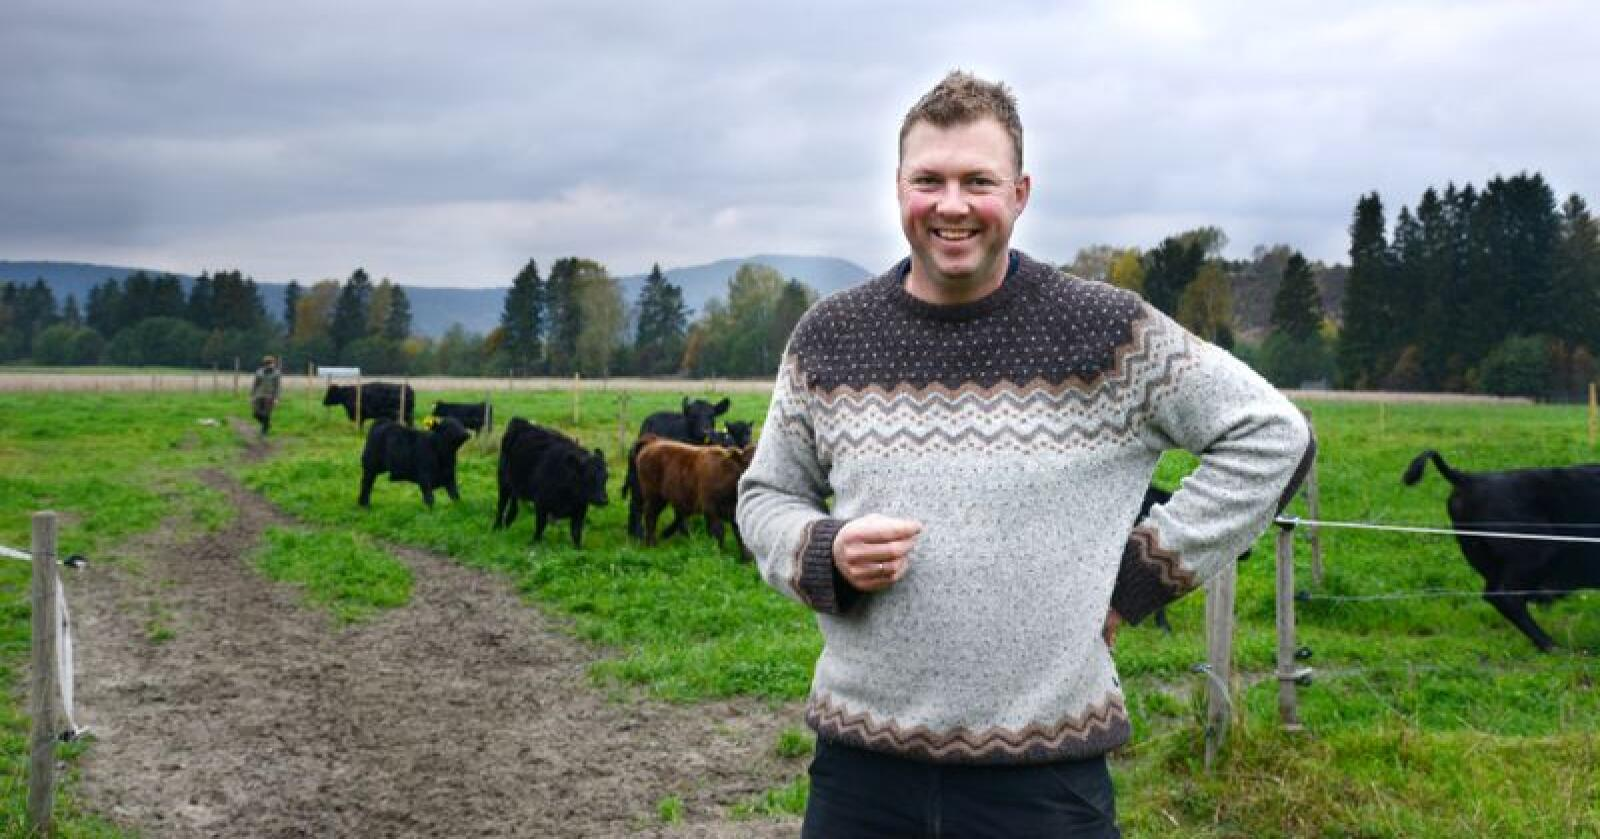 Økobonde Tore Jardar Skjønsholt Wirgenes i Larvik sel gårdens produkter direkte til forbrukaren. Foto: Siri Juell Rasmussen